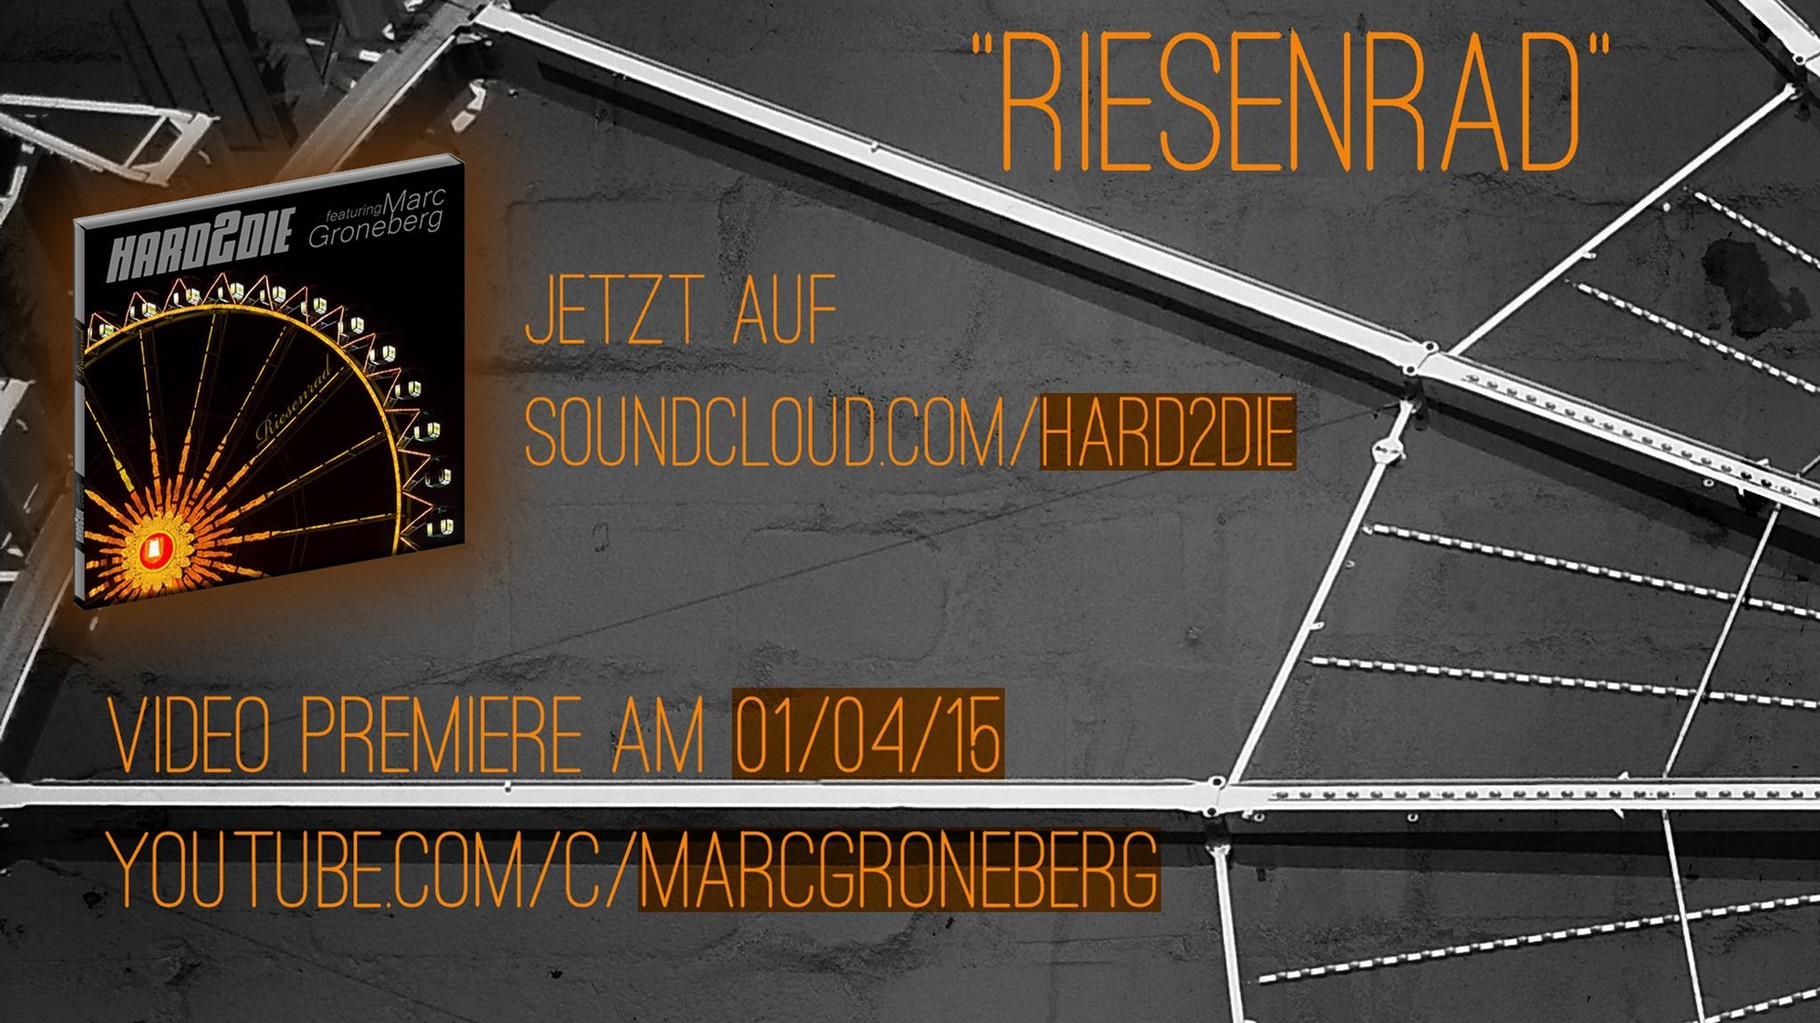 hard2die feat. Marc Groneberg - Riesenrad © Marc Groneberg | #socialmedia #hard2die #marcgroneberg